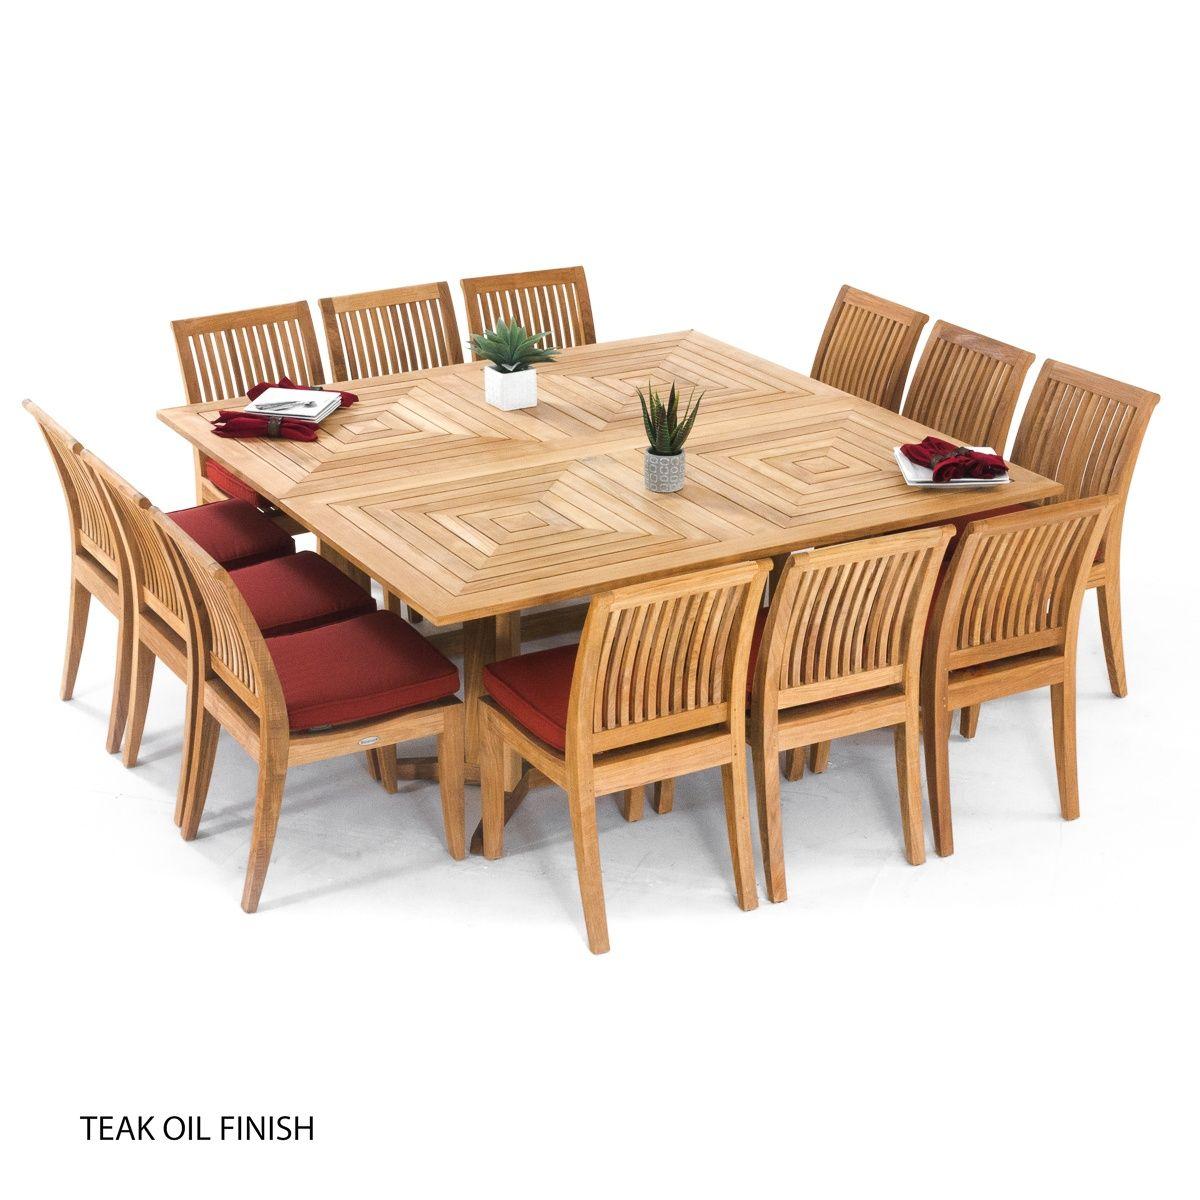 Large Teak Dining Set For 12 People